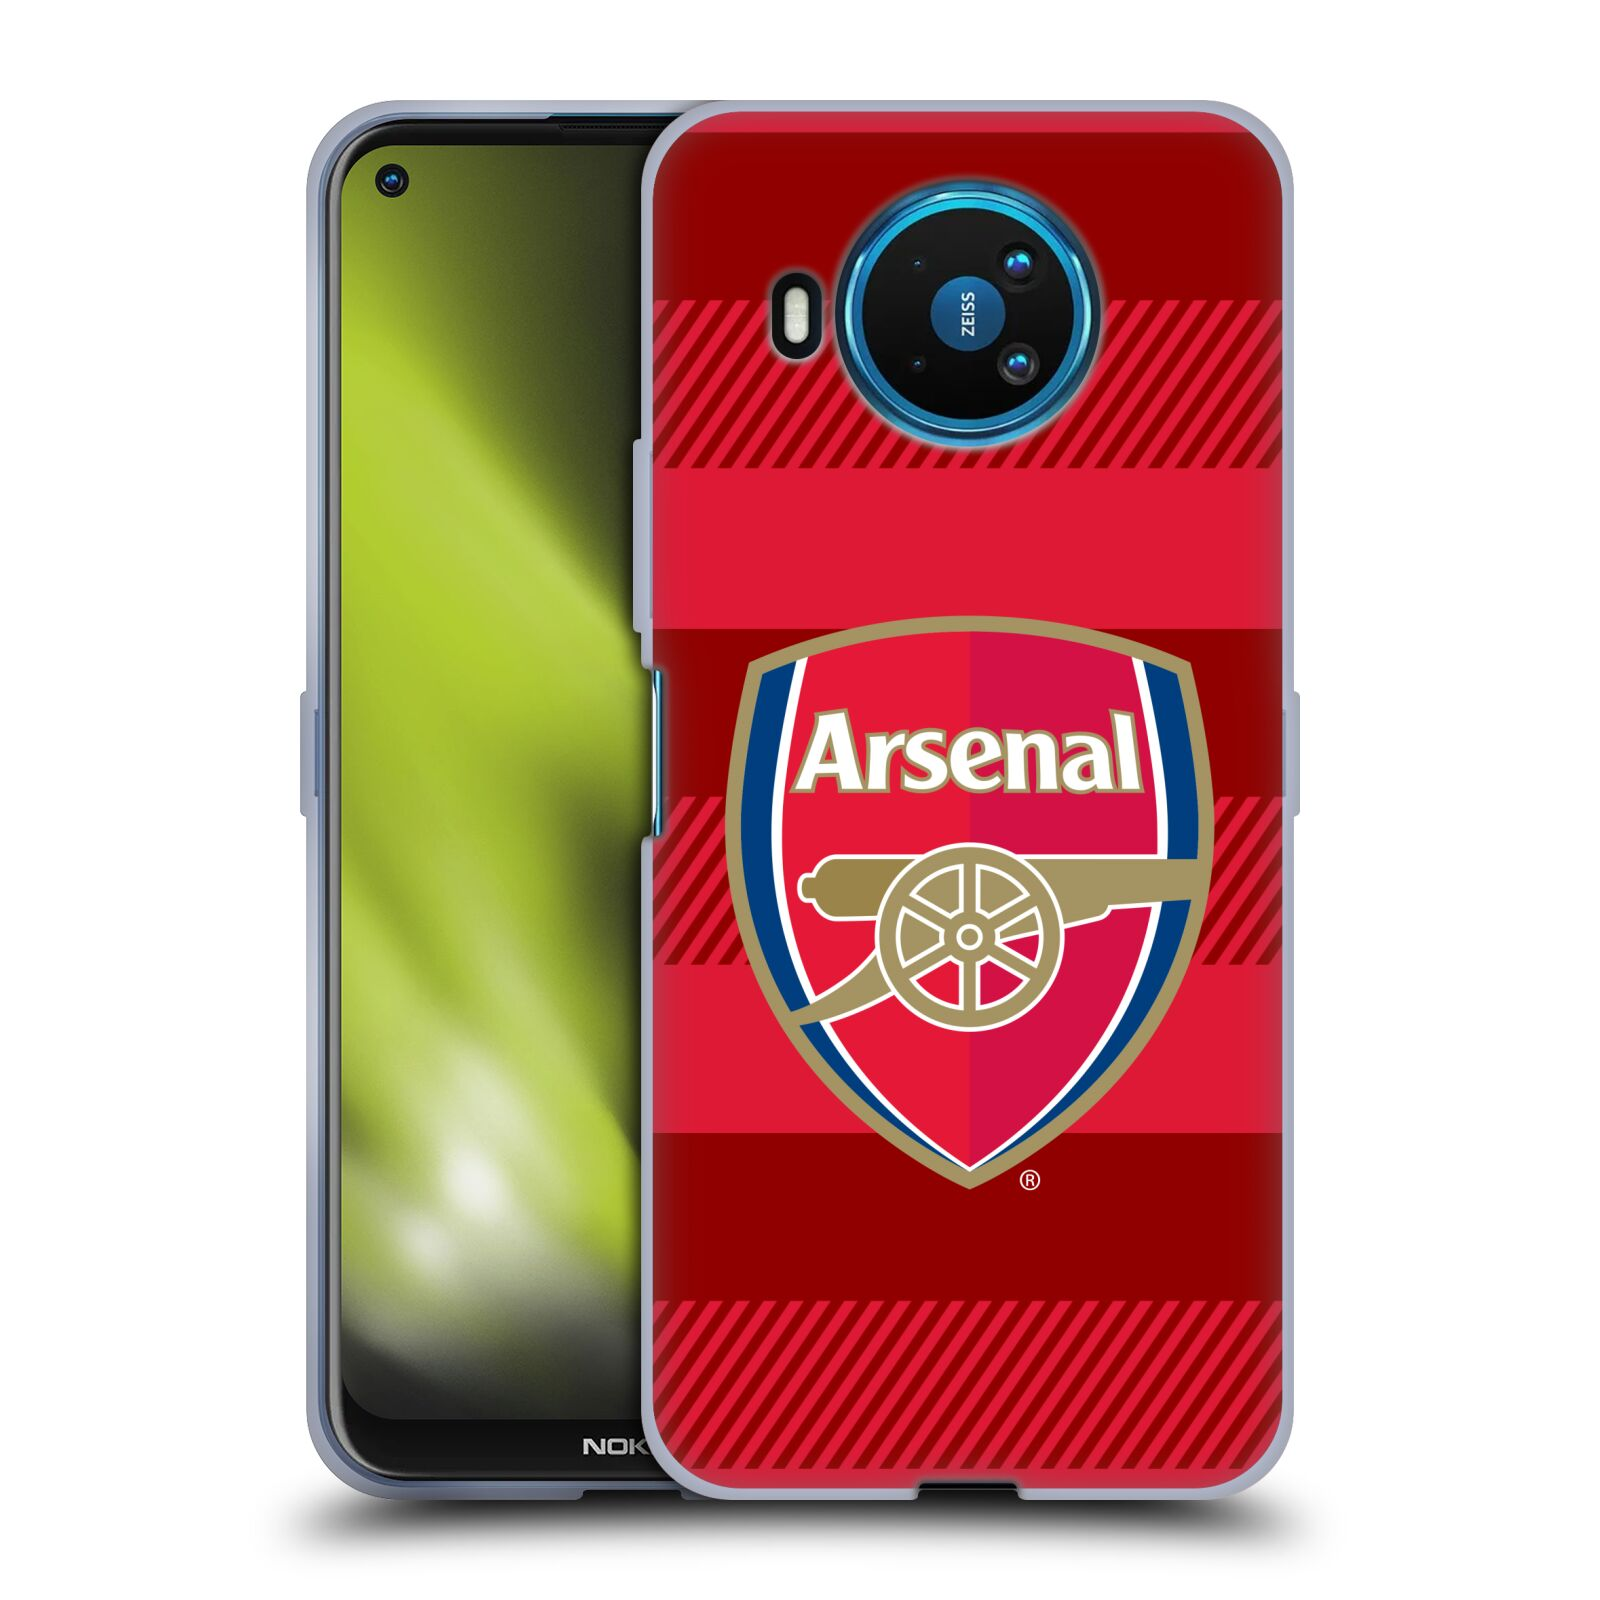 Silikonové pouzdro na mobil Nokia 8.3 5G - Head Case - Arsenal FC - Logo s pruhy